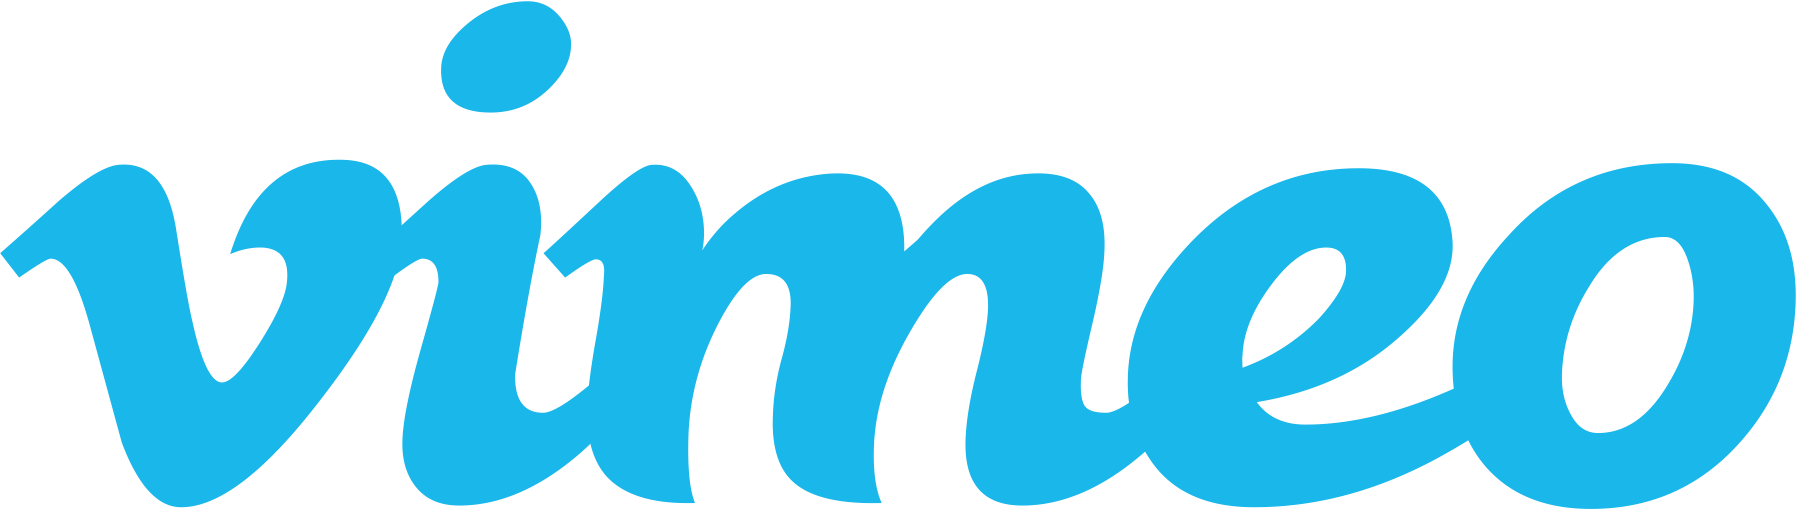 Vimeo Logo transparent PNG.